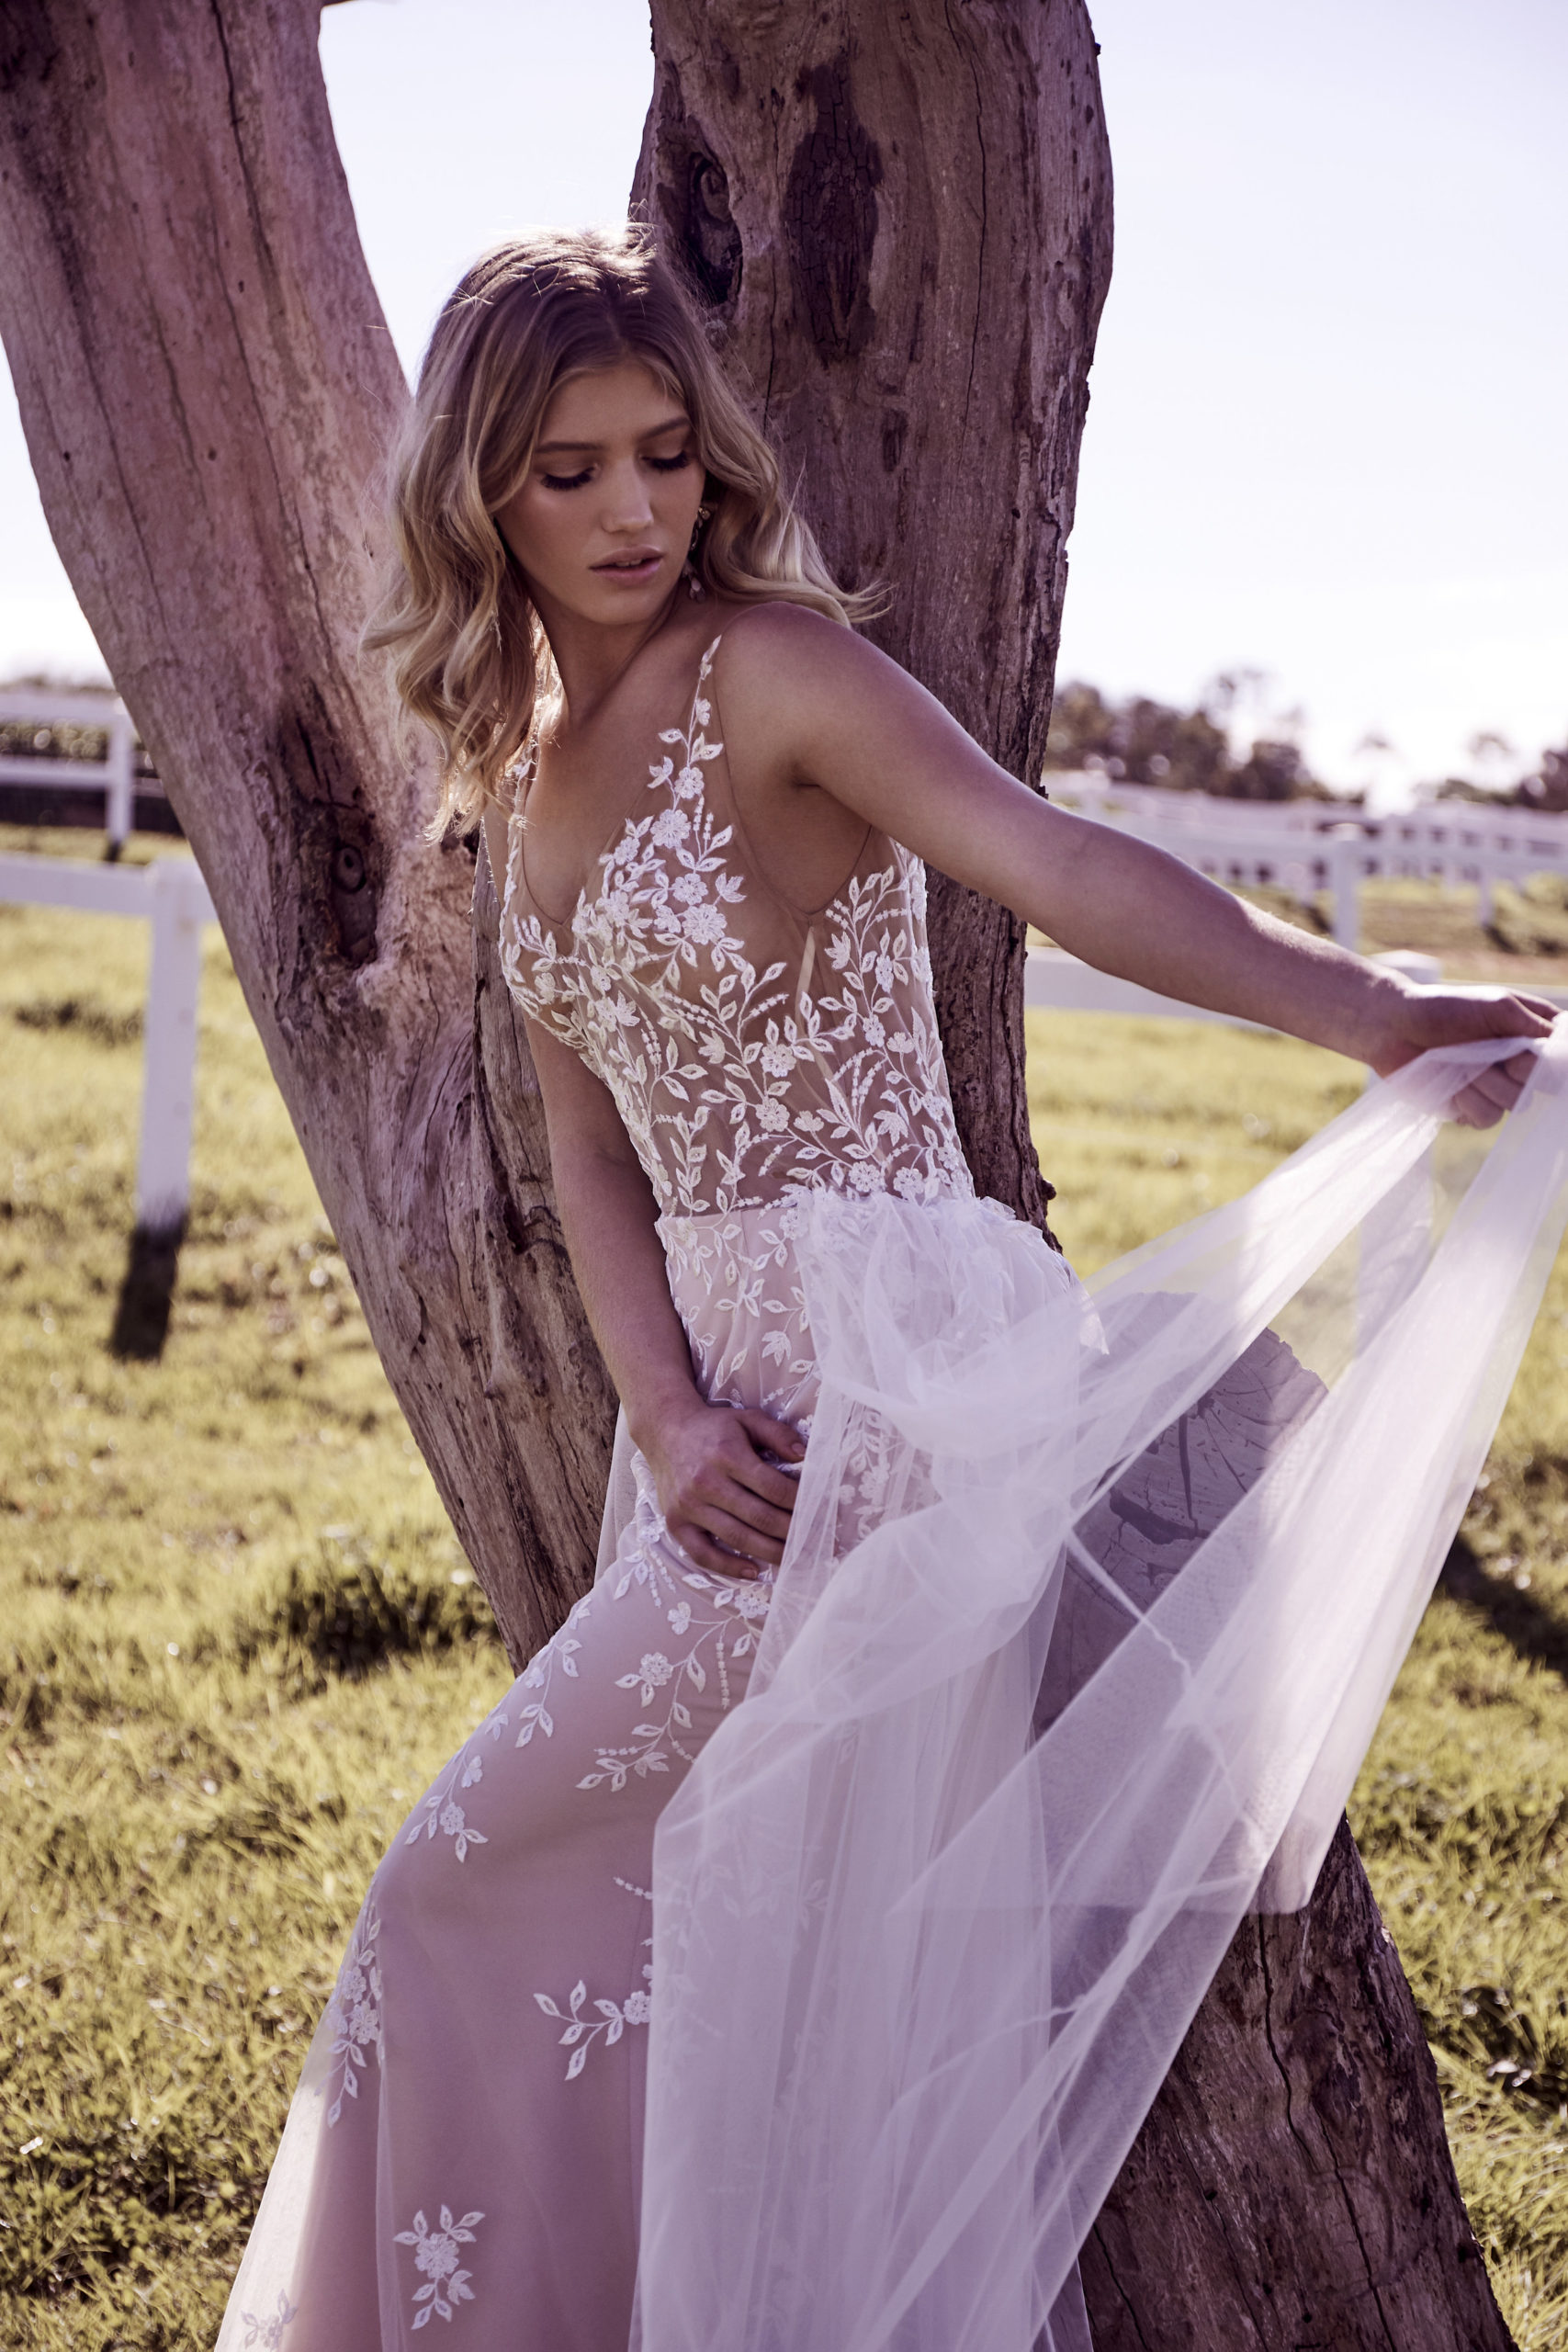 Wedding Dresses - White Embroided Wedding Dress Sitting on a Tree